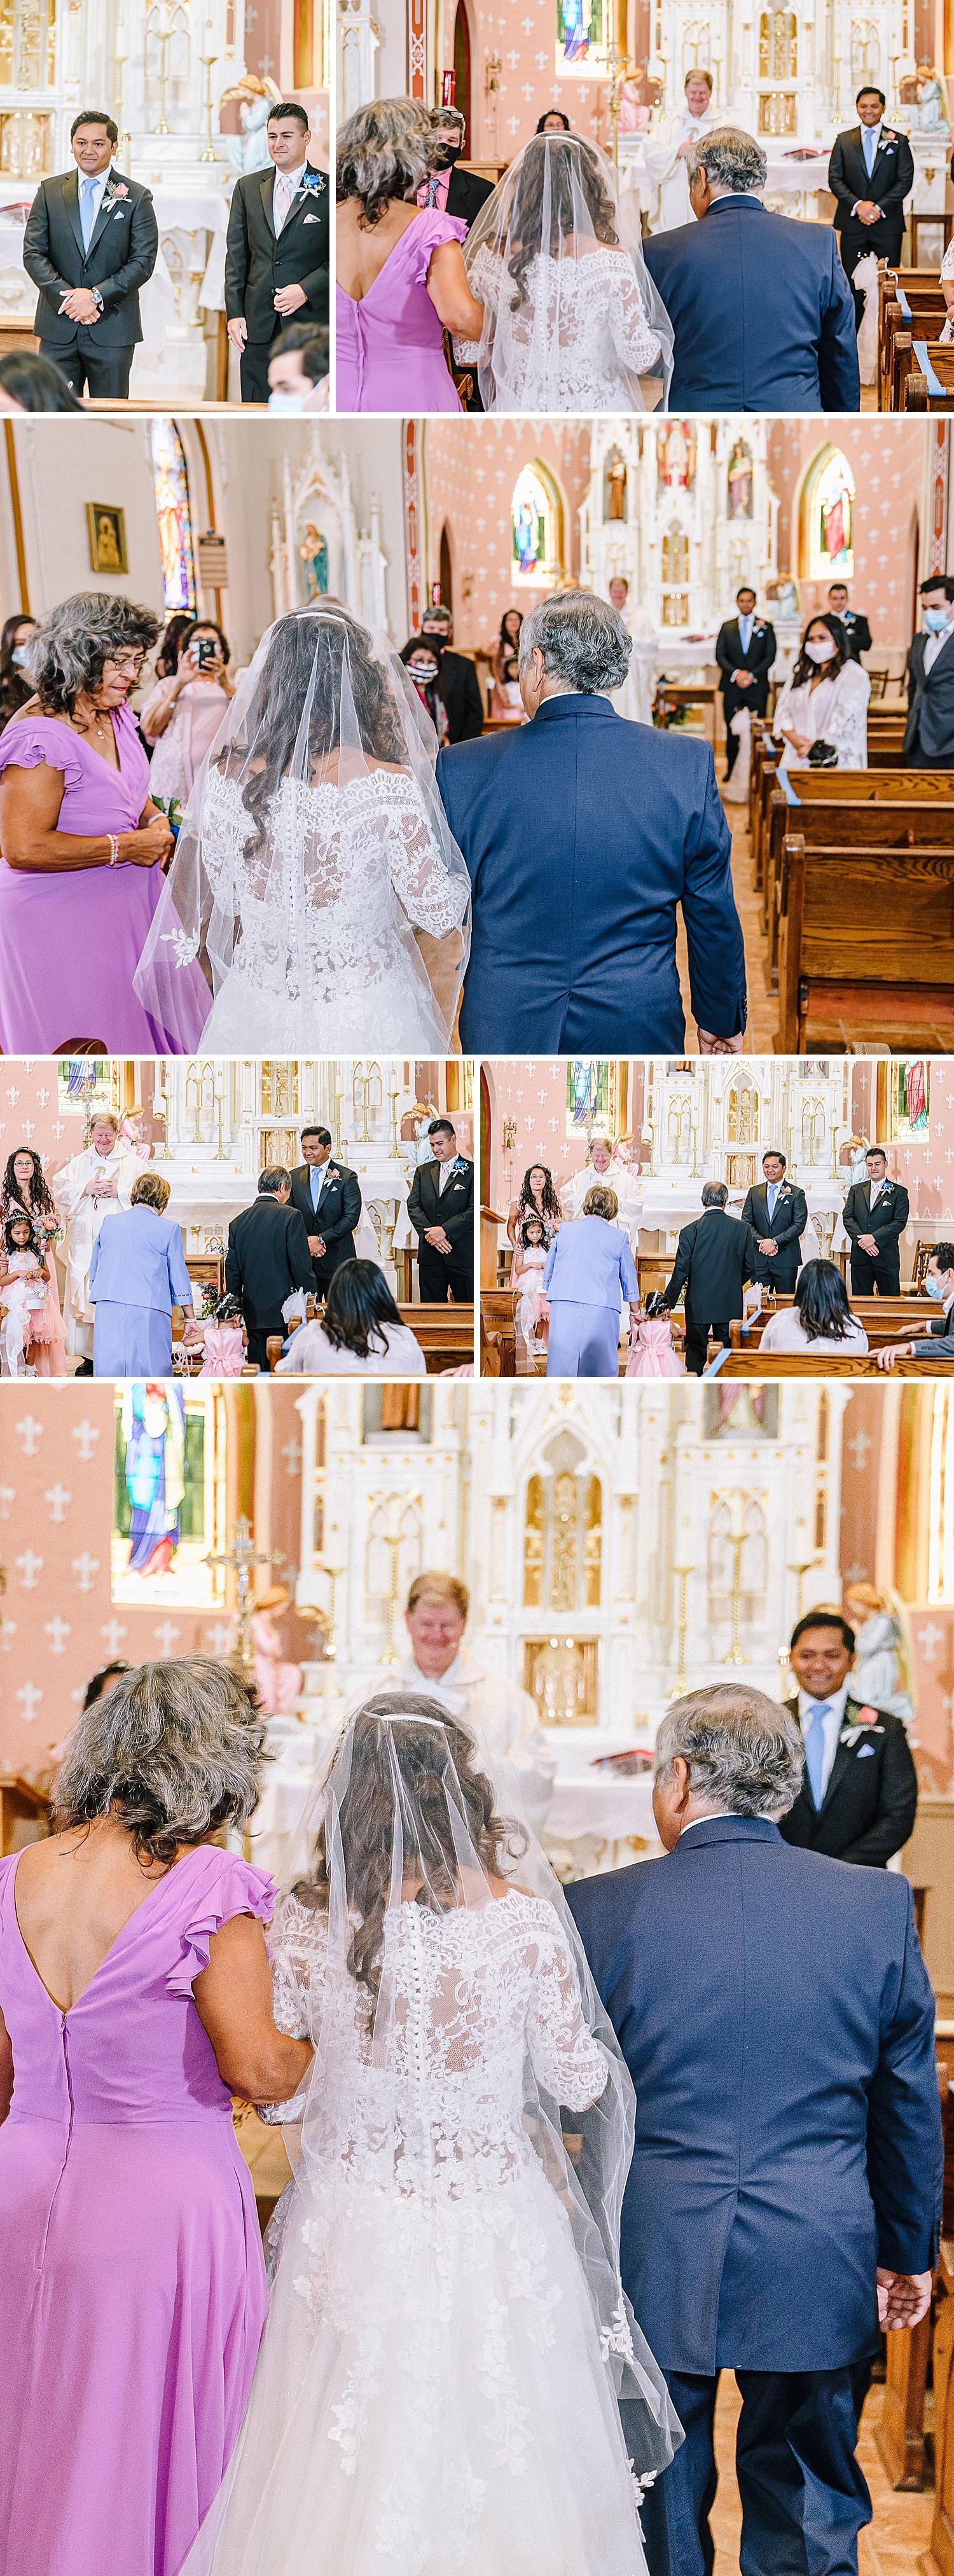 Bandera-Texas-Wedding-Photographer-Bride-Groom-on-Horses-Carly-Barton-Photography_0079.jpg